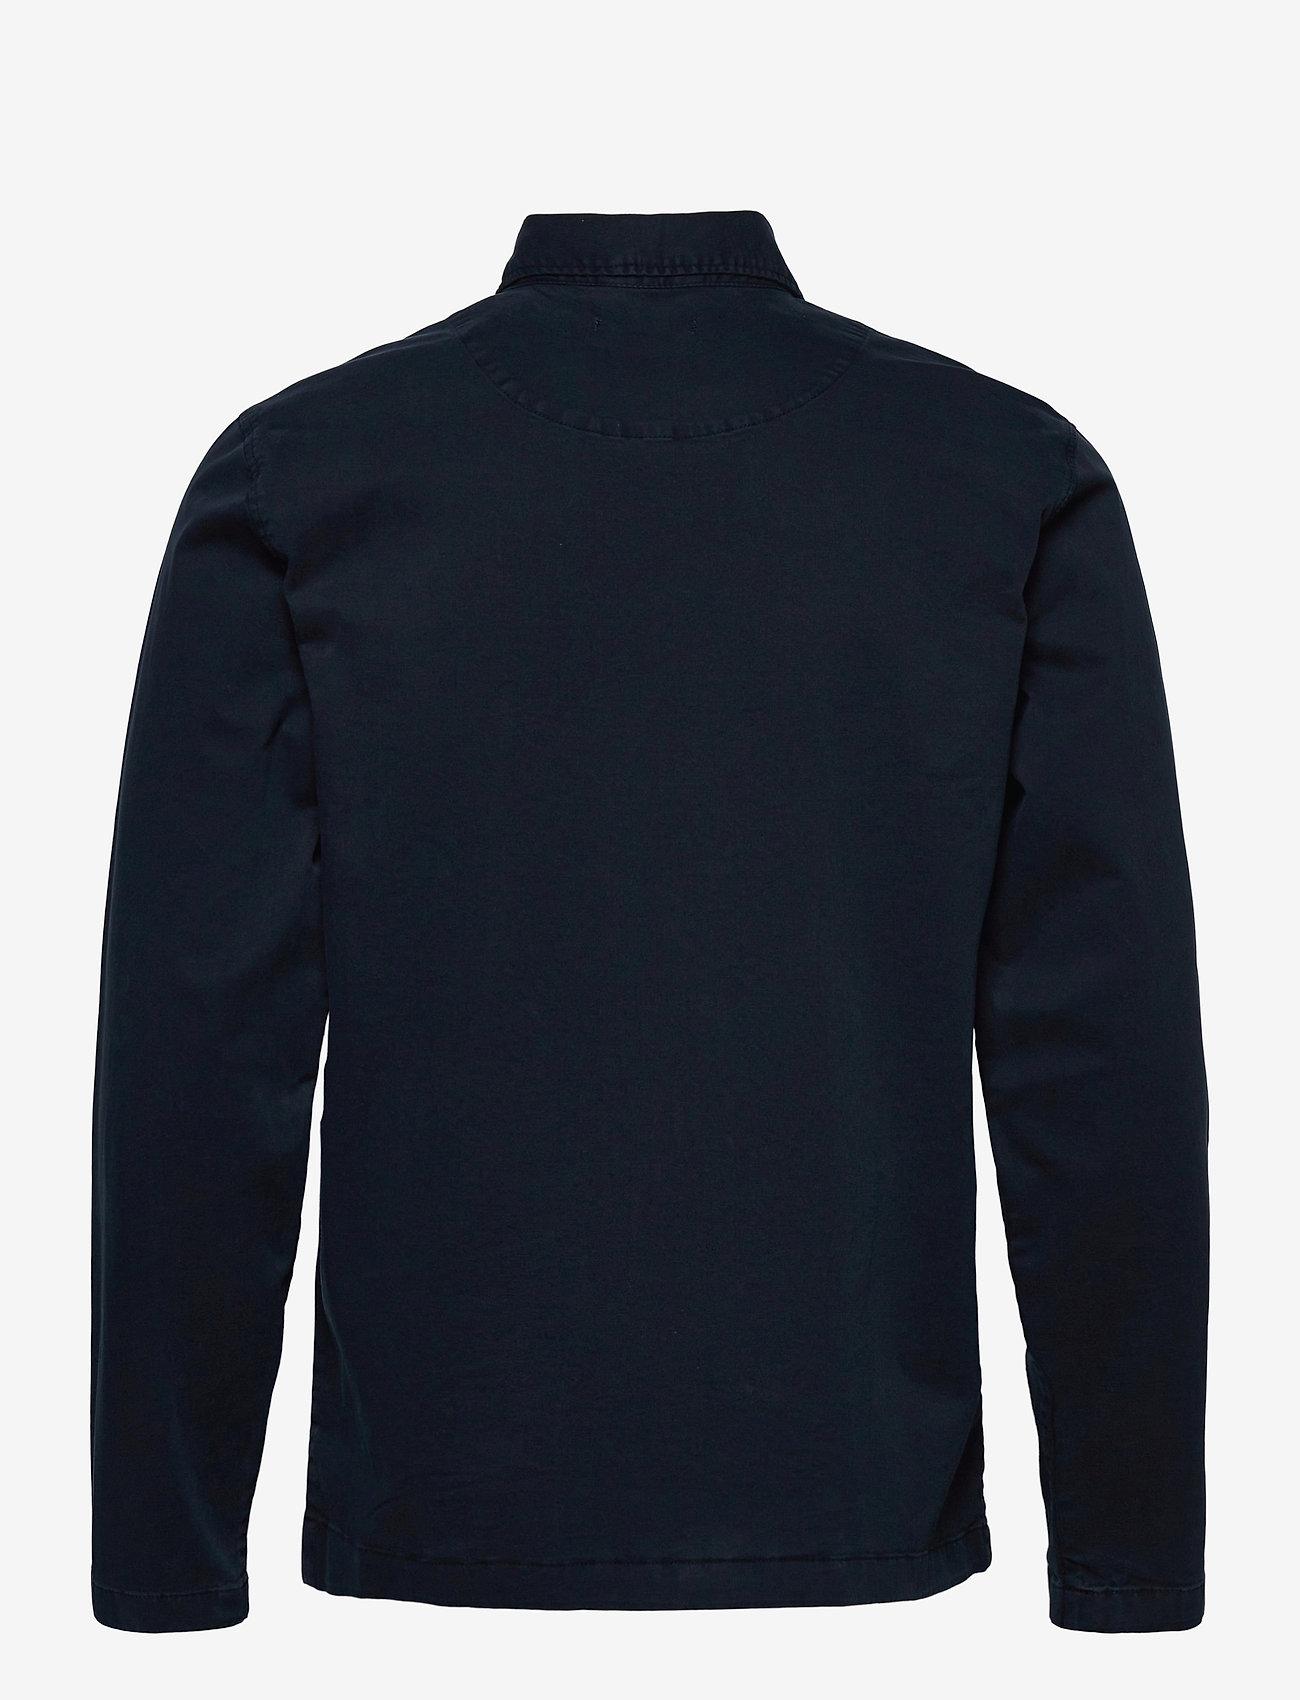 Knowledge Cotton Apparel - PINE poplin overshirt - GOTS/Vegan - vêtements - total eclipse - 1